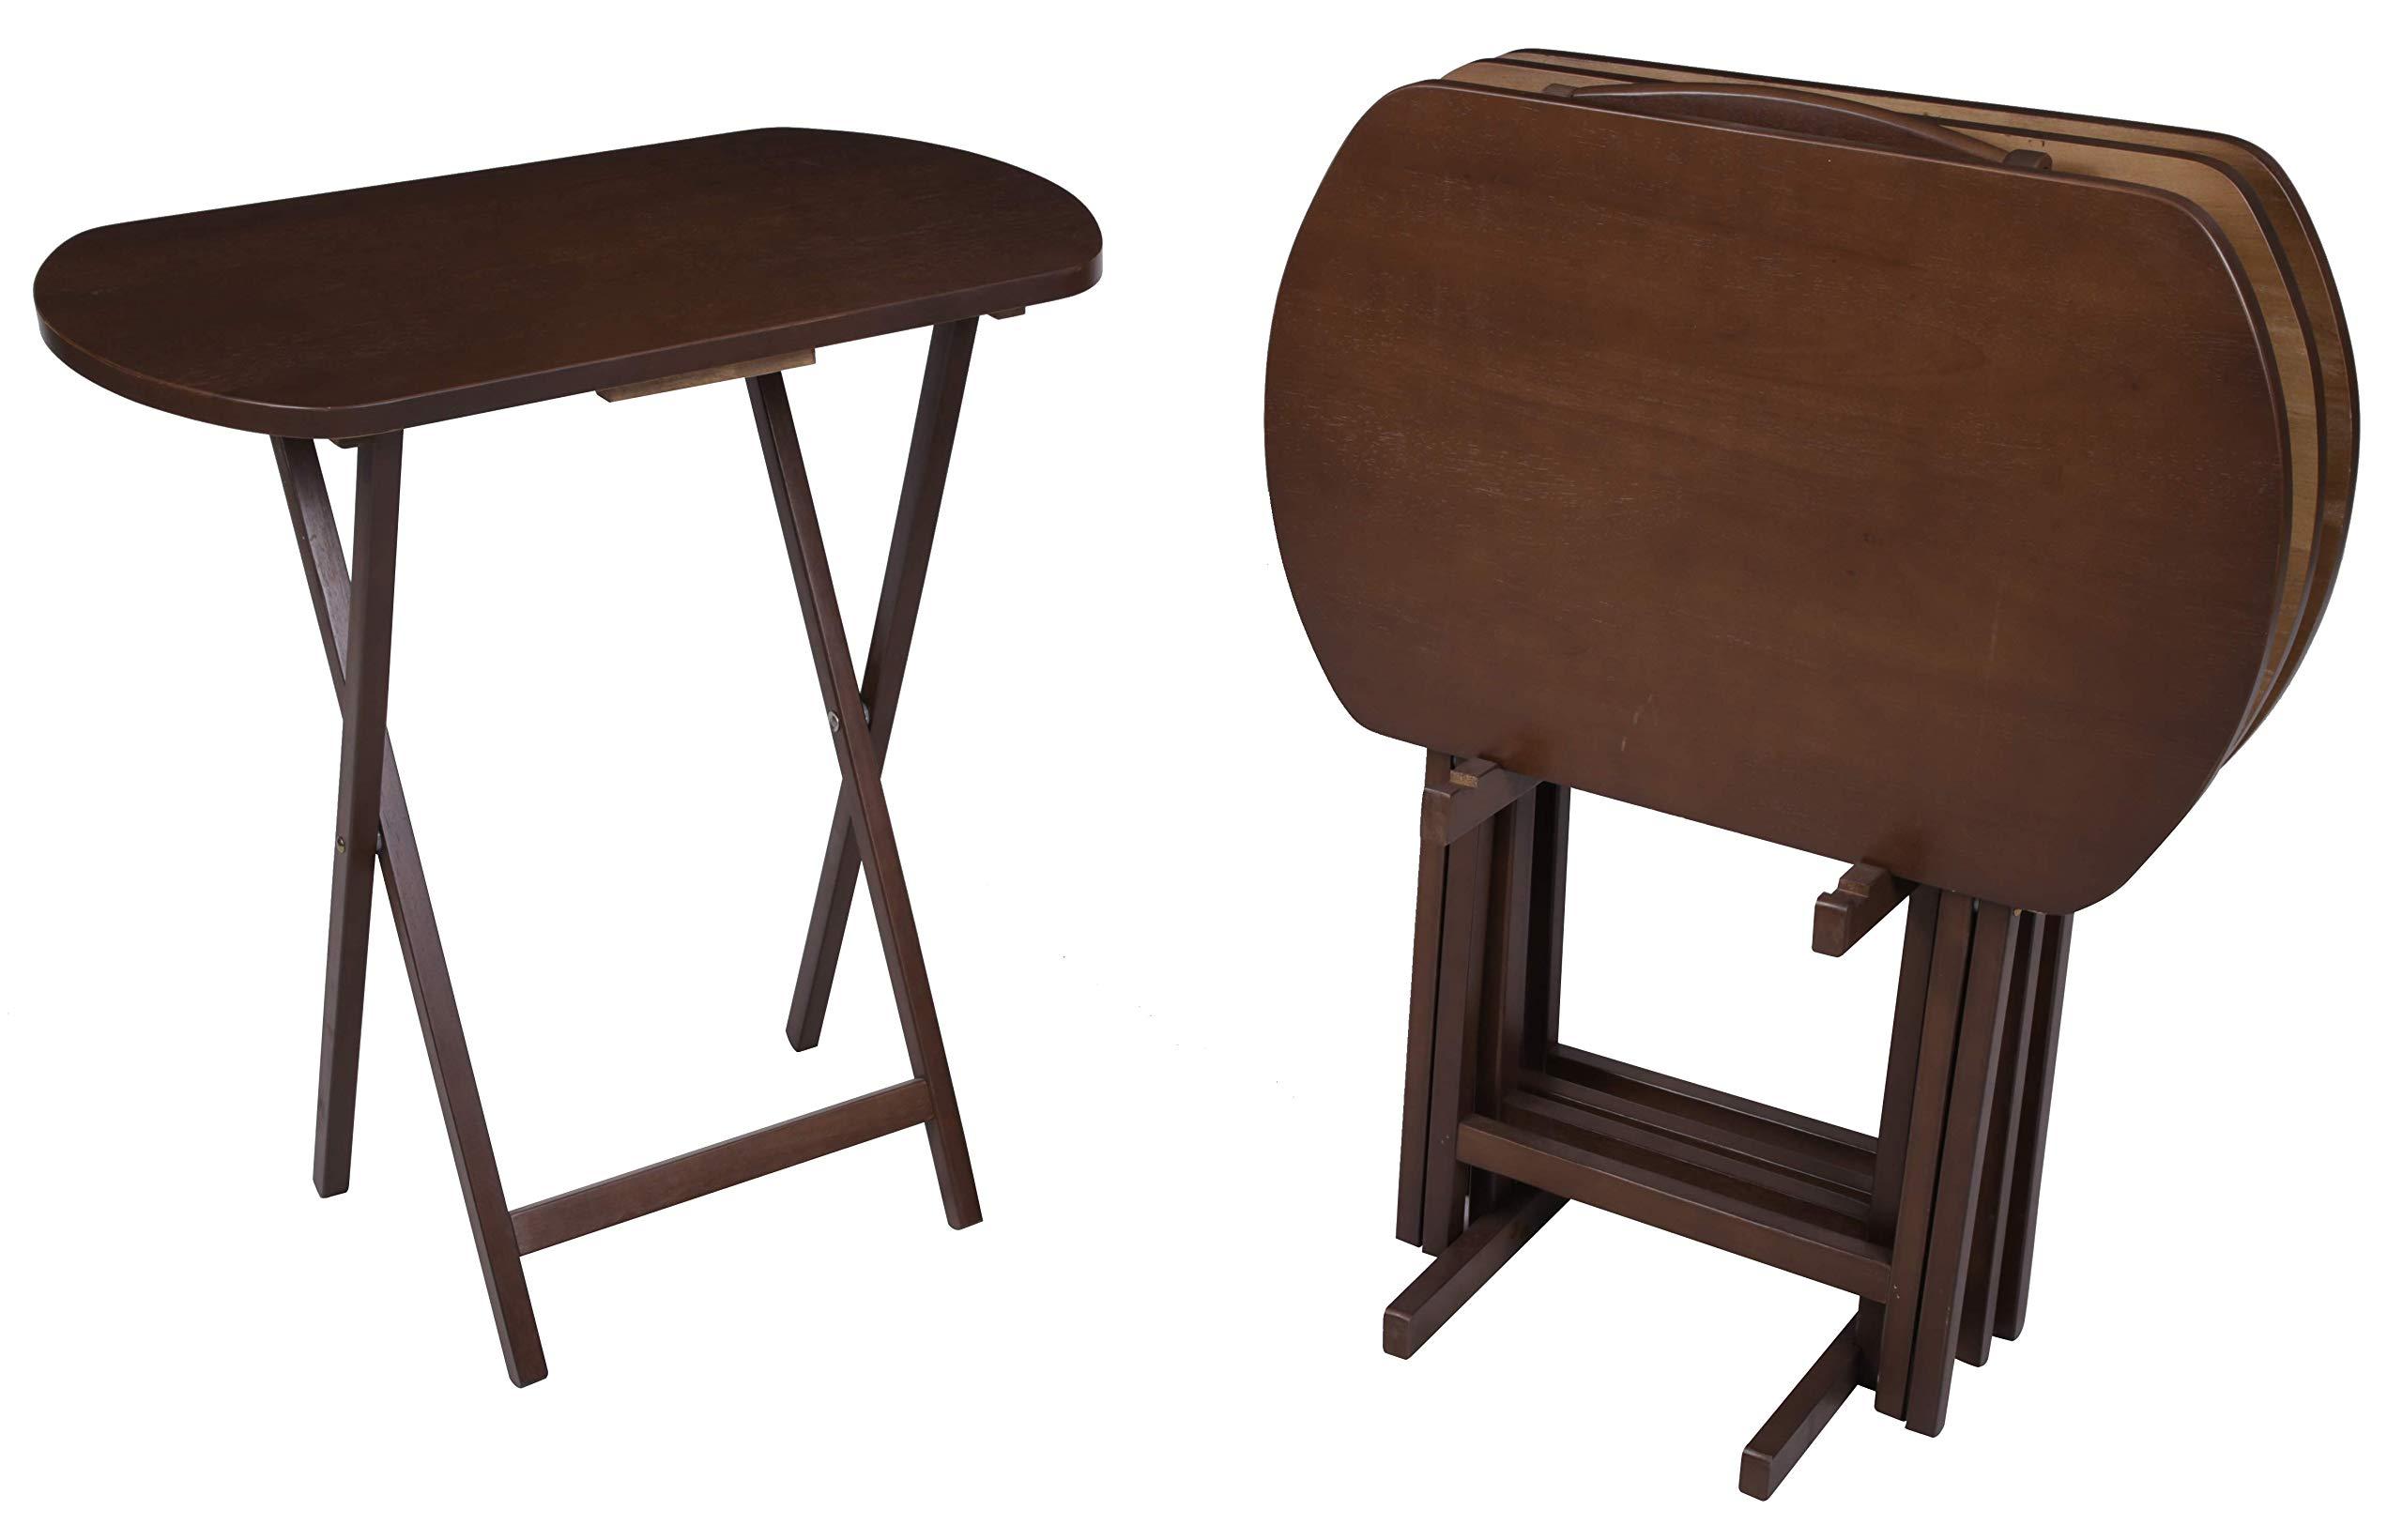 PJ Wood 5-piece Large Oval Folding TV Tray & Snack Table - Walnut by PJ Wood